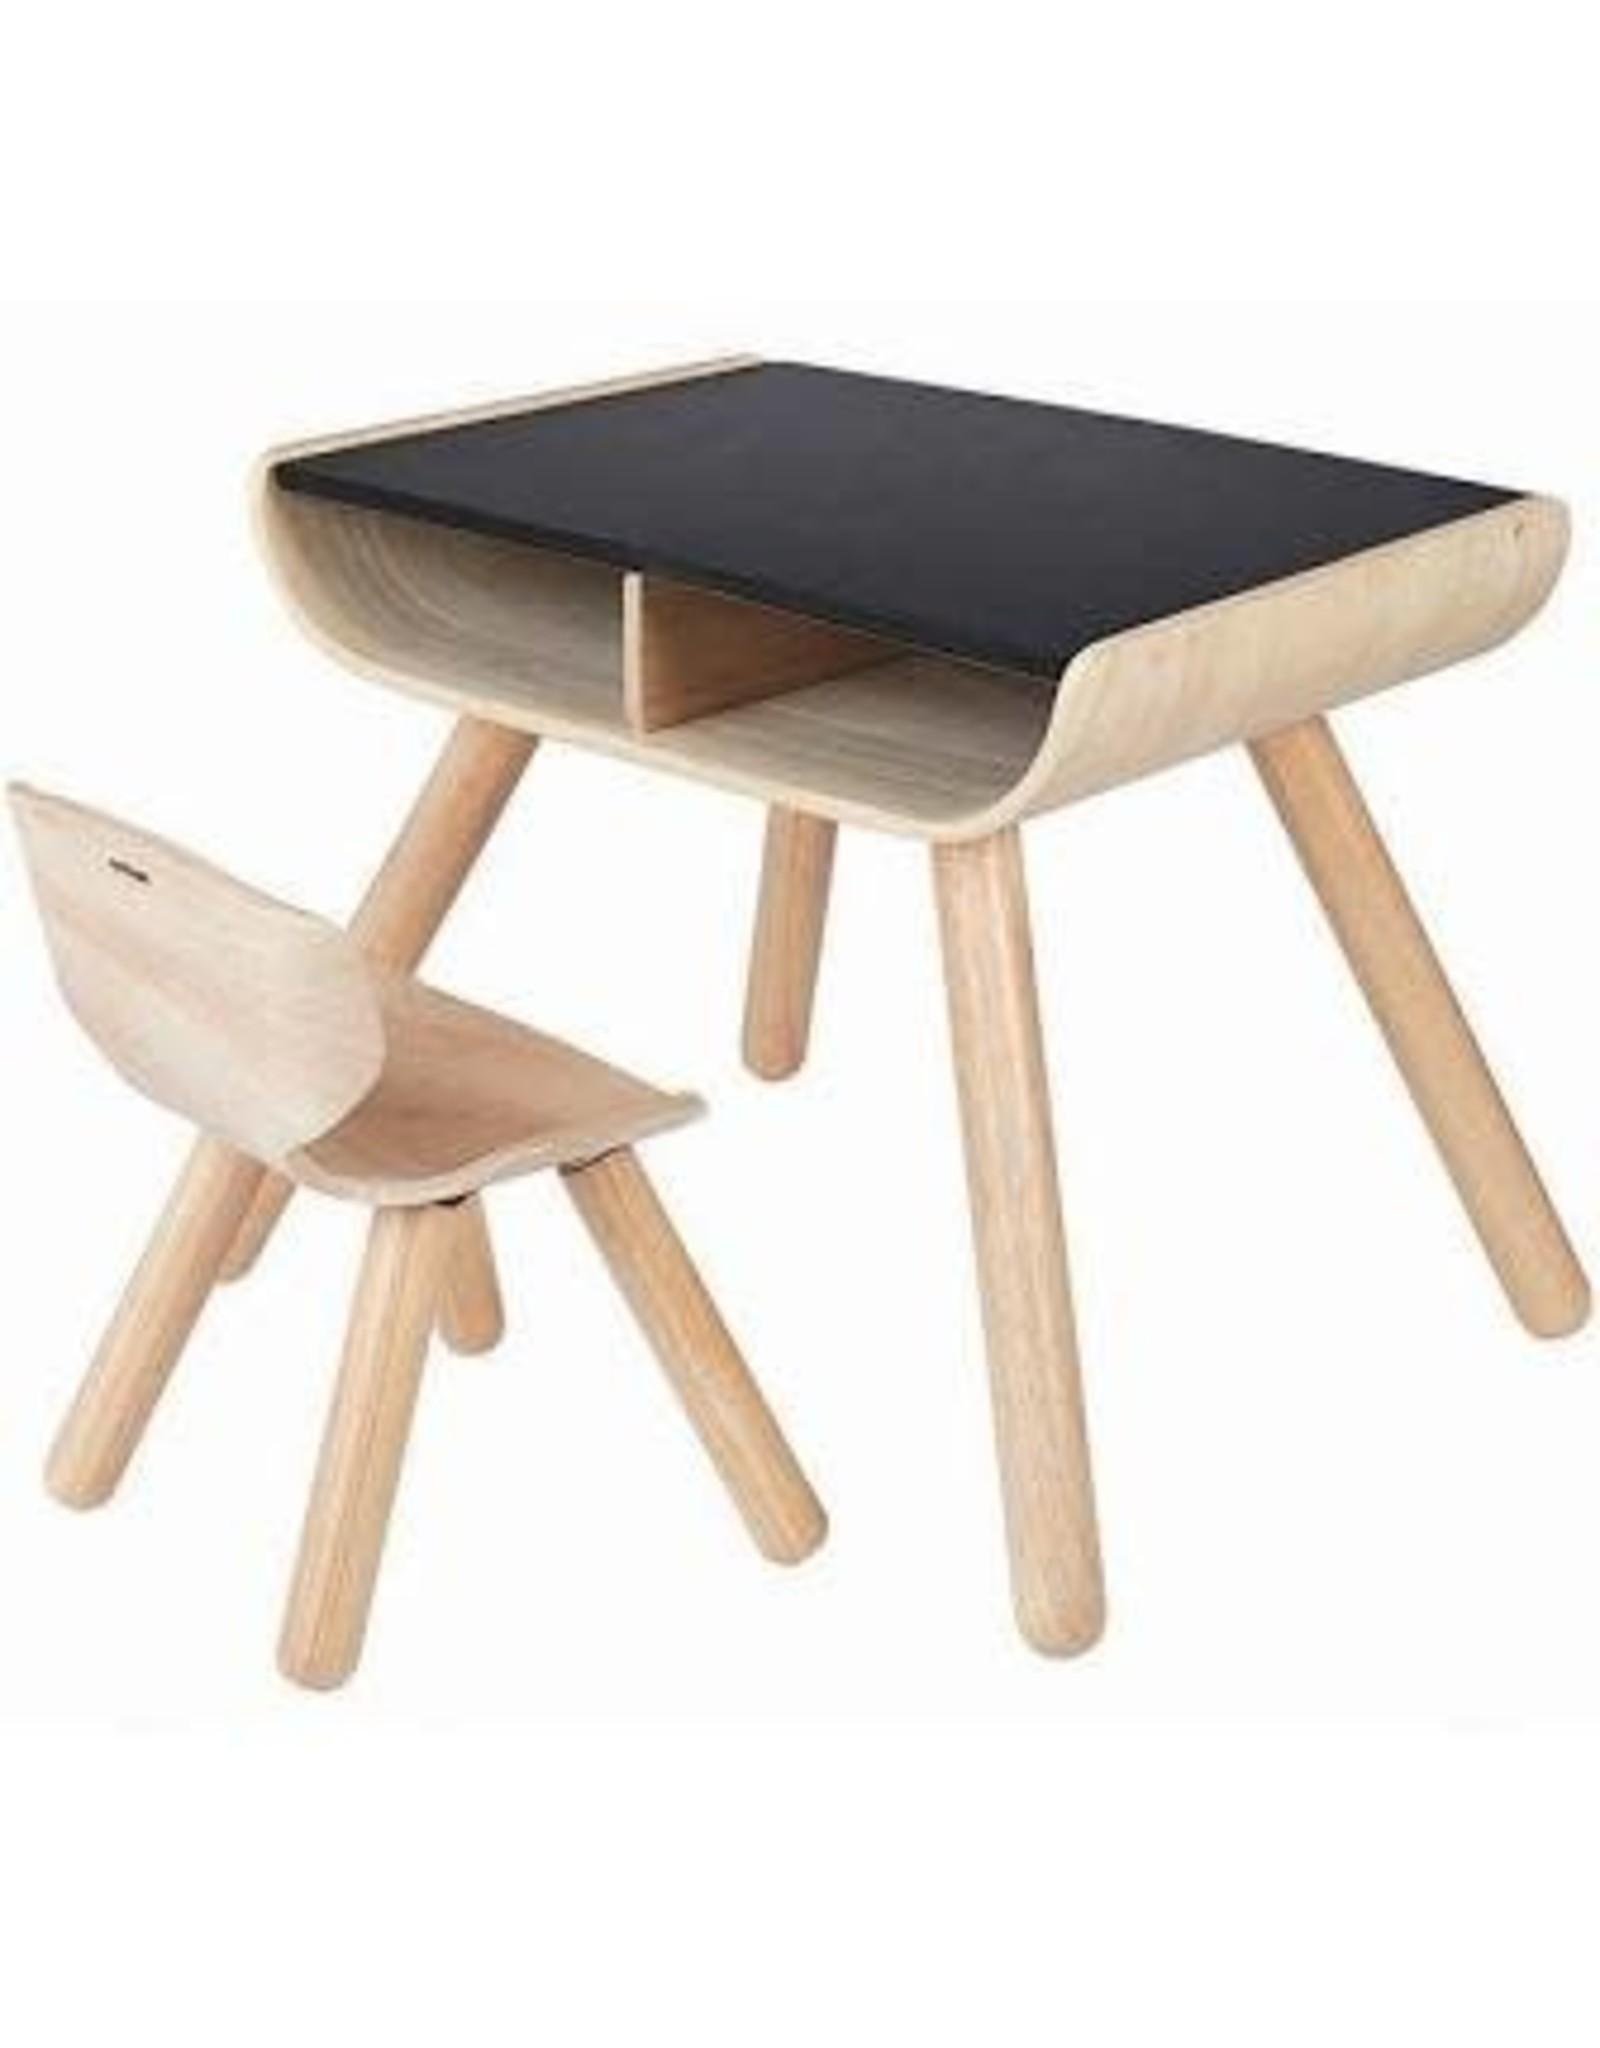 PLAN TOYS PLAN TOYS TABLE & CHAIR